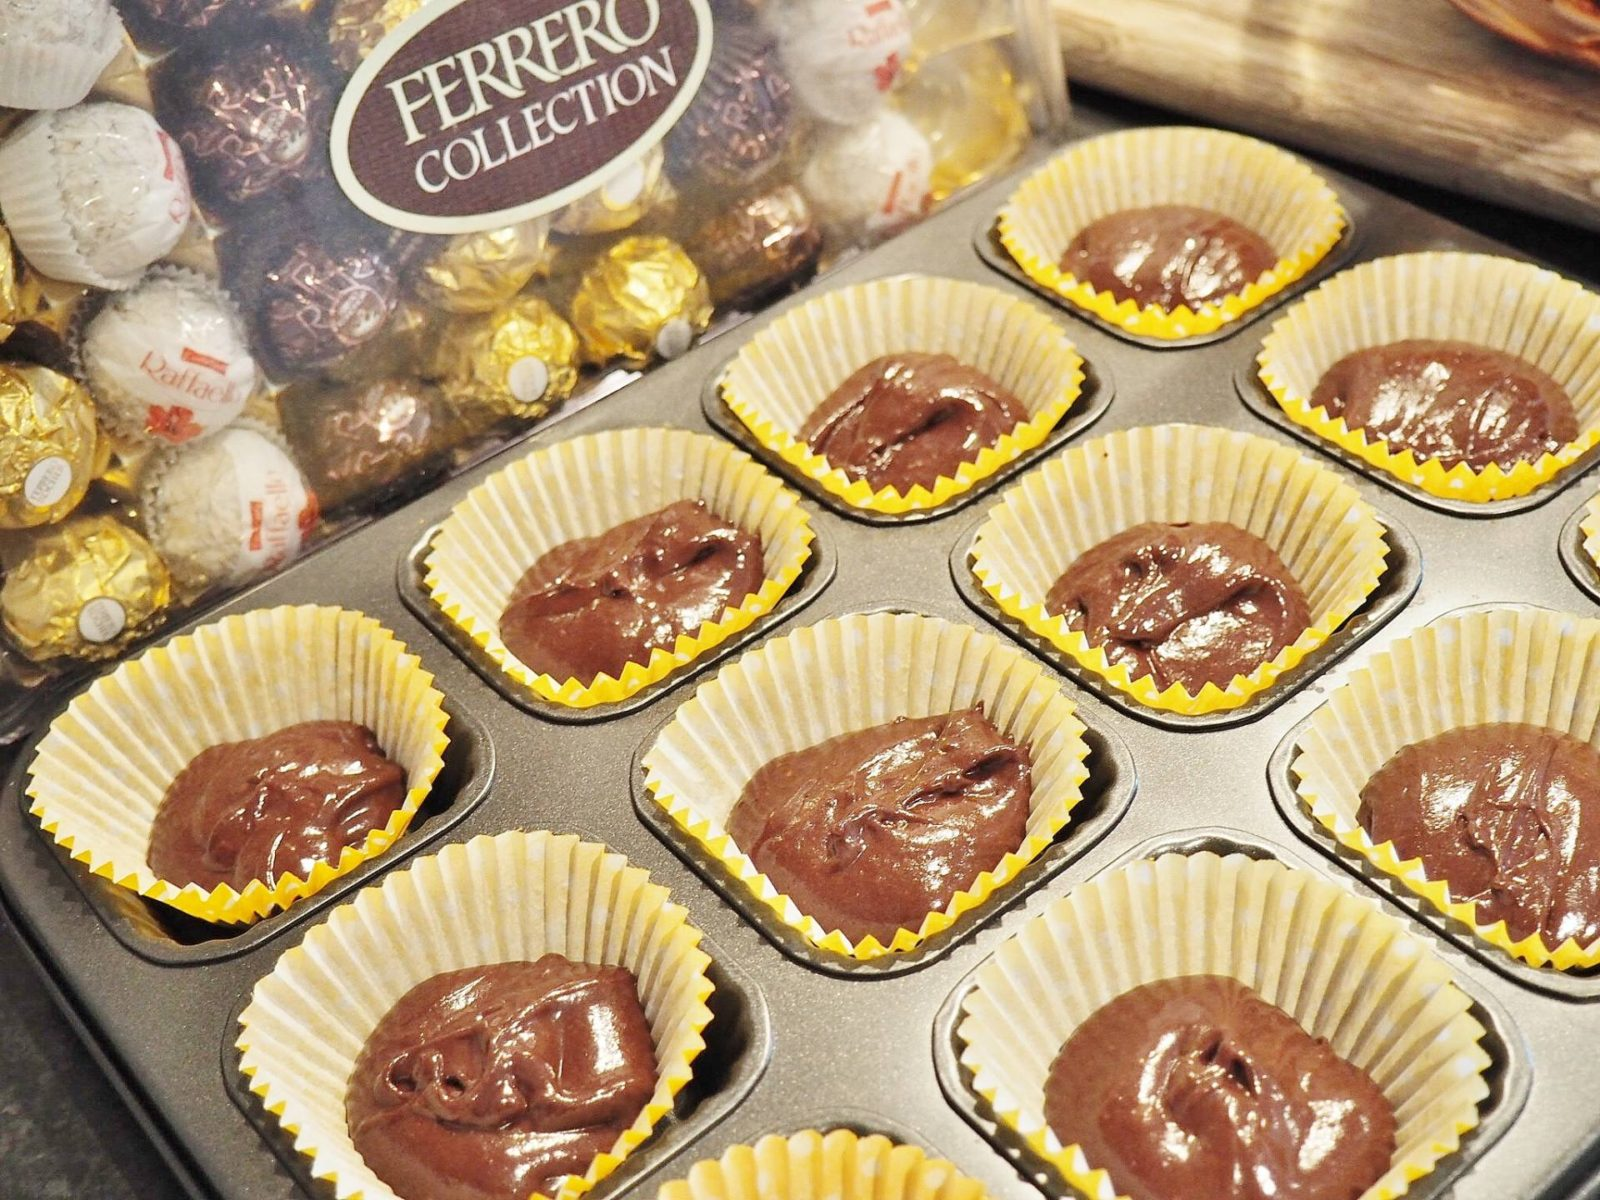 Fererro Rocher Cupcakes Baking